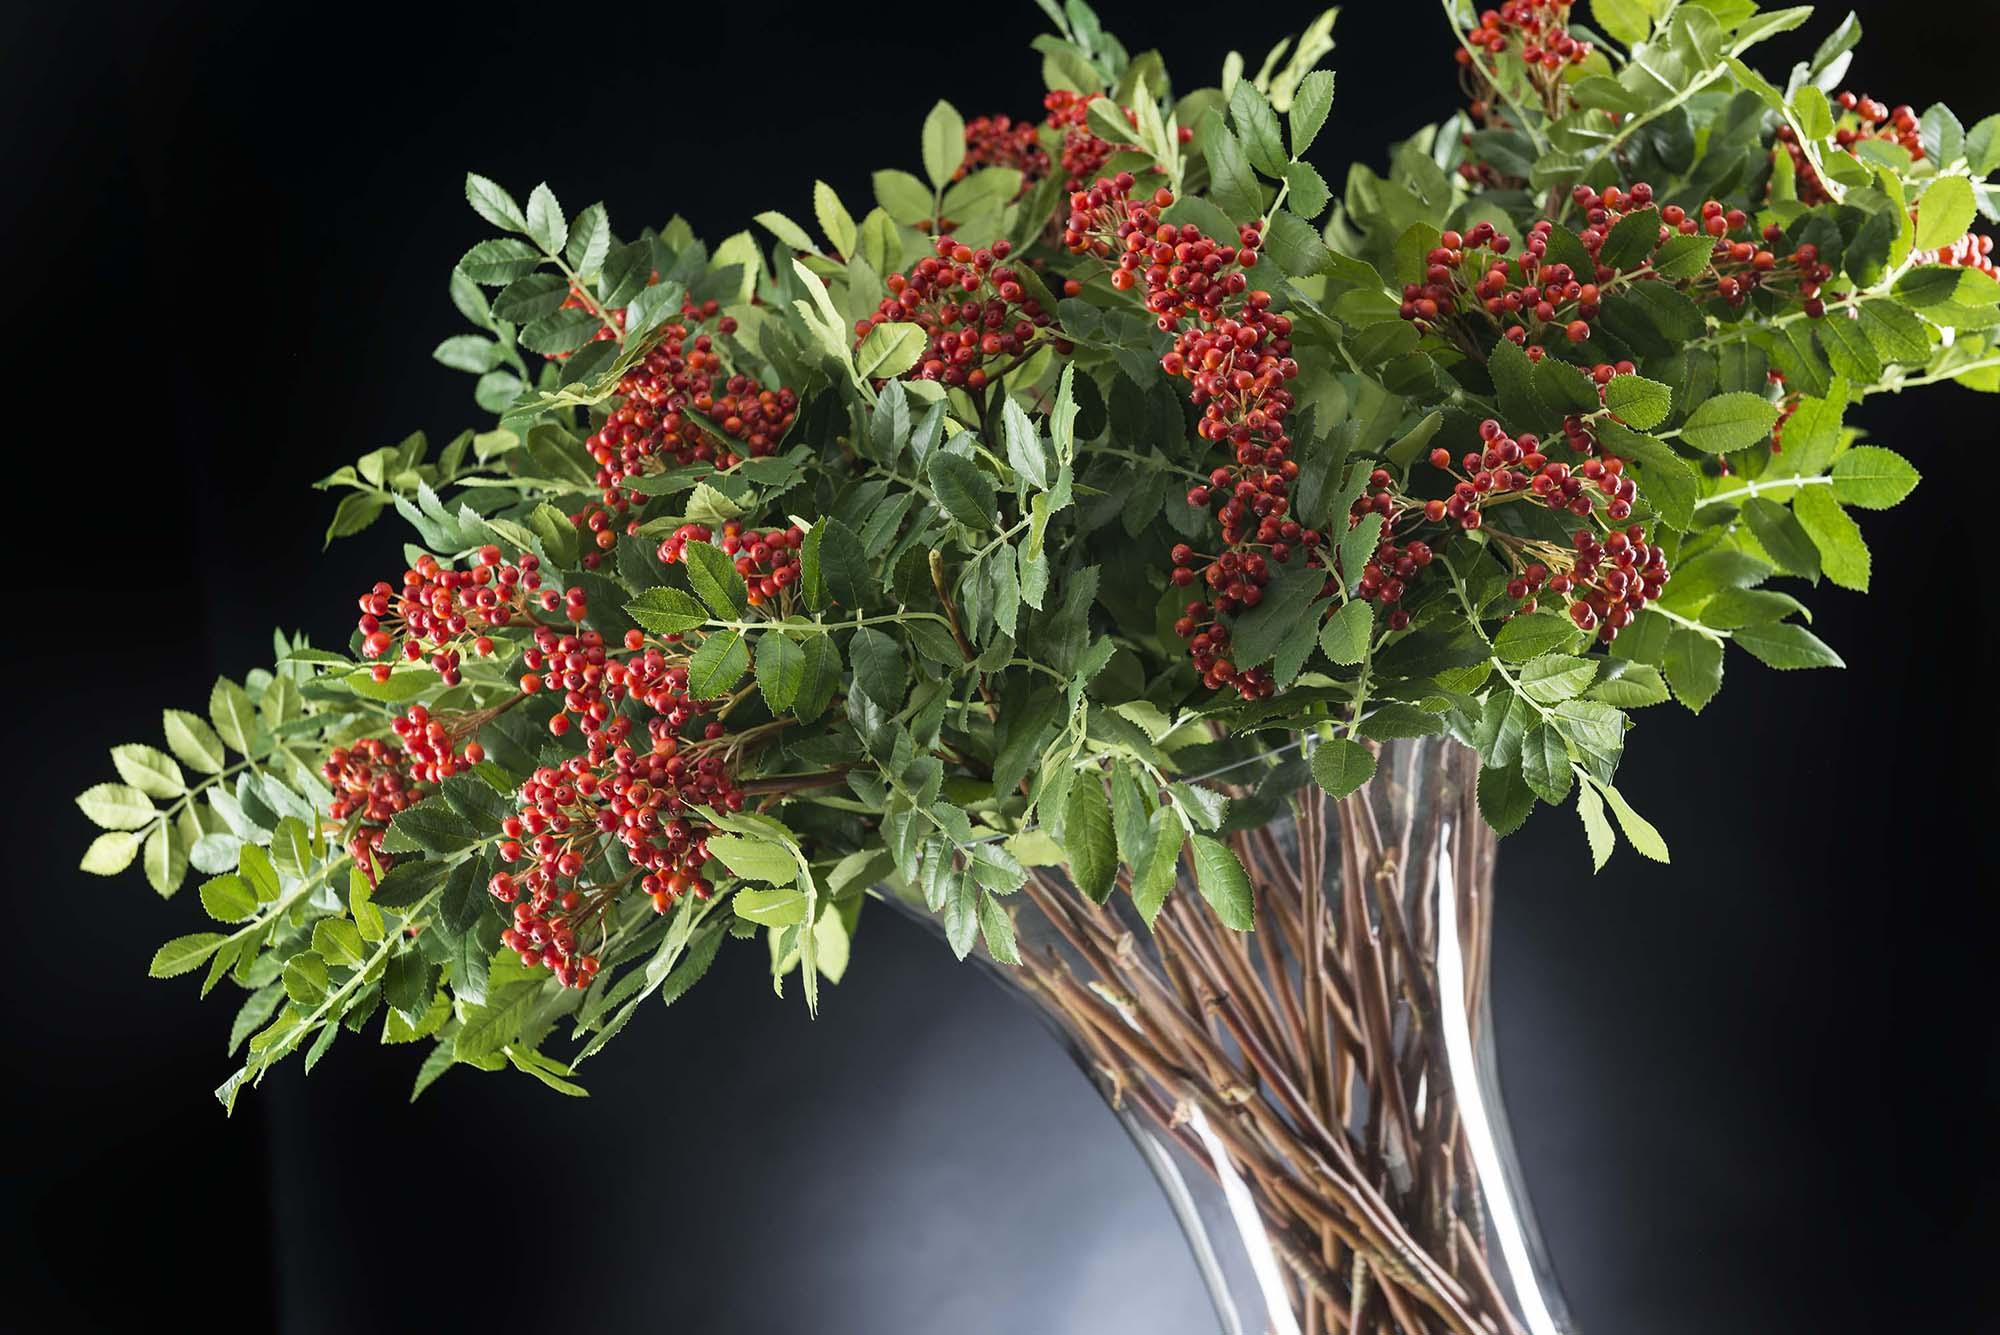 Interiors Advent Calendar - Eternity Bowl Red Berries via Masha Shapiro Agency UK.jpg